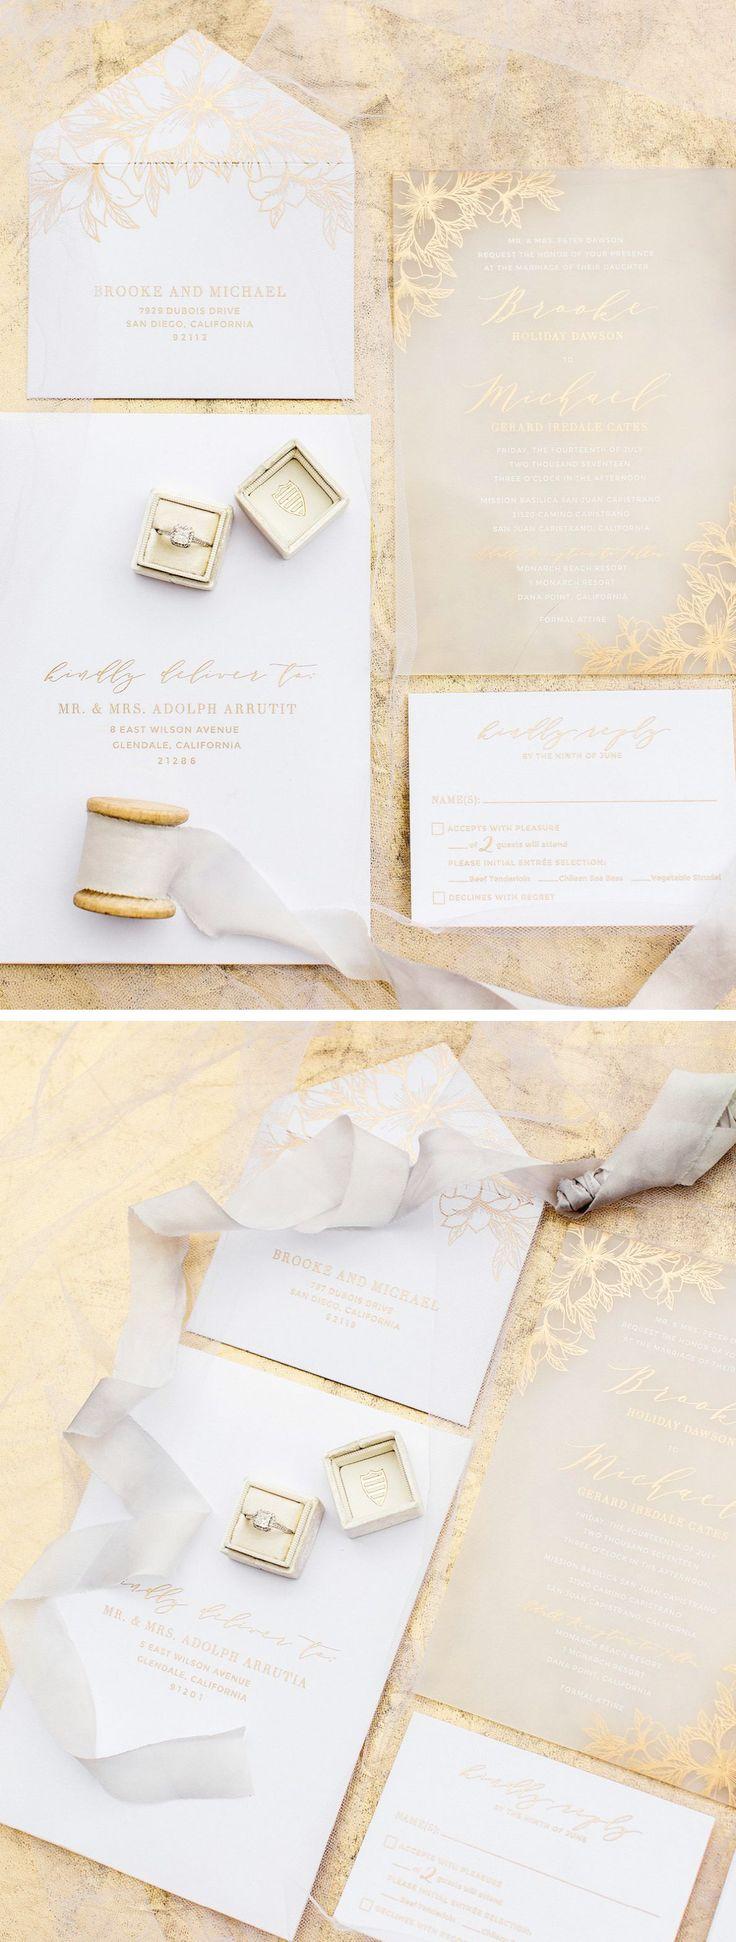 Wedding Crashers Full Cast; Wedding Dresses Cost both